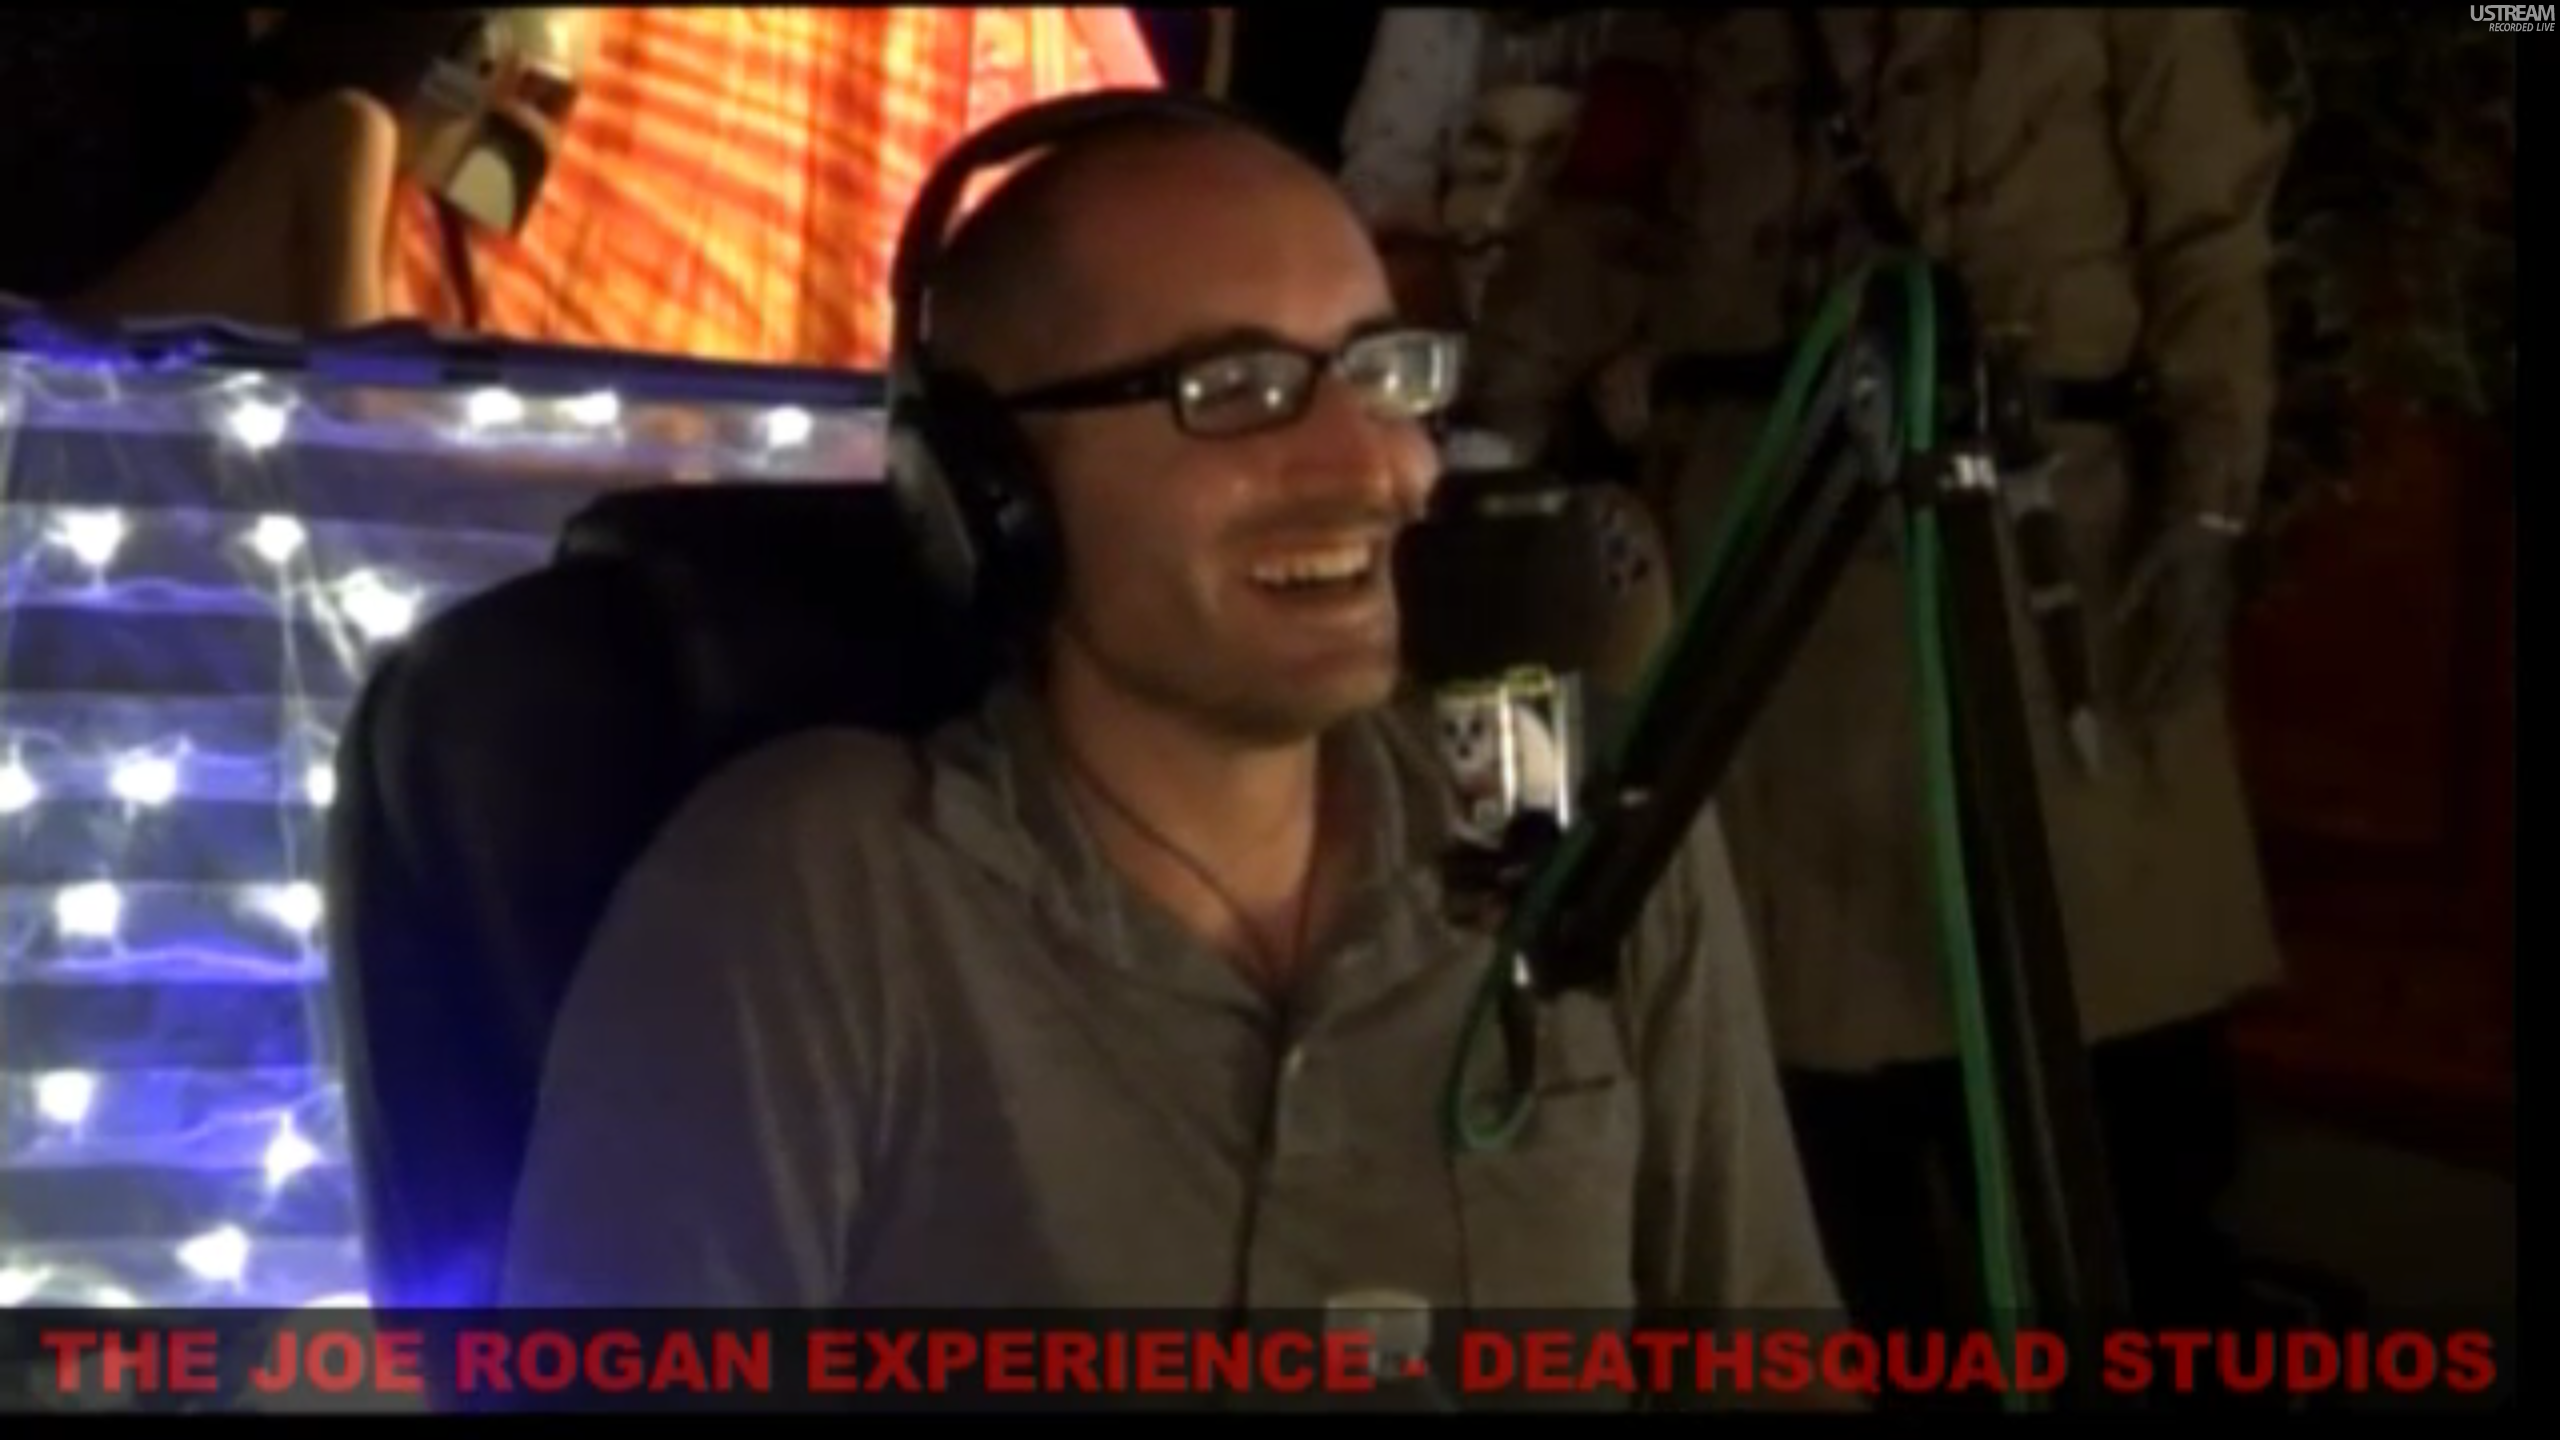 The Joe Rogan Experience #242 - Justin Halpern, Brian Redban